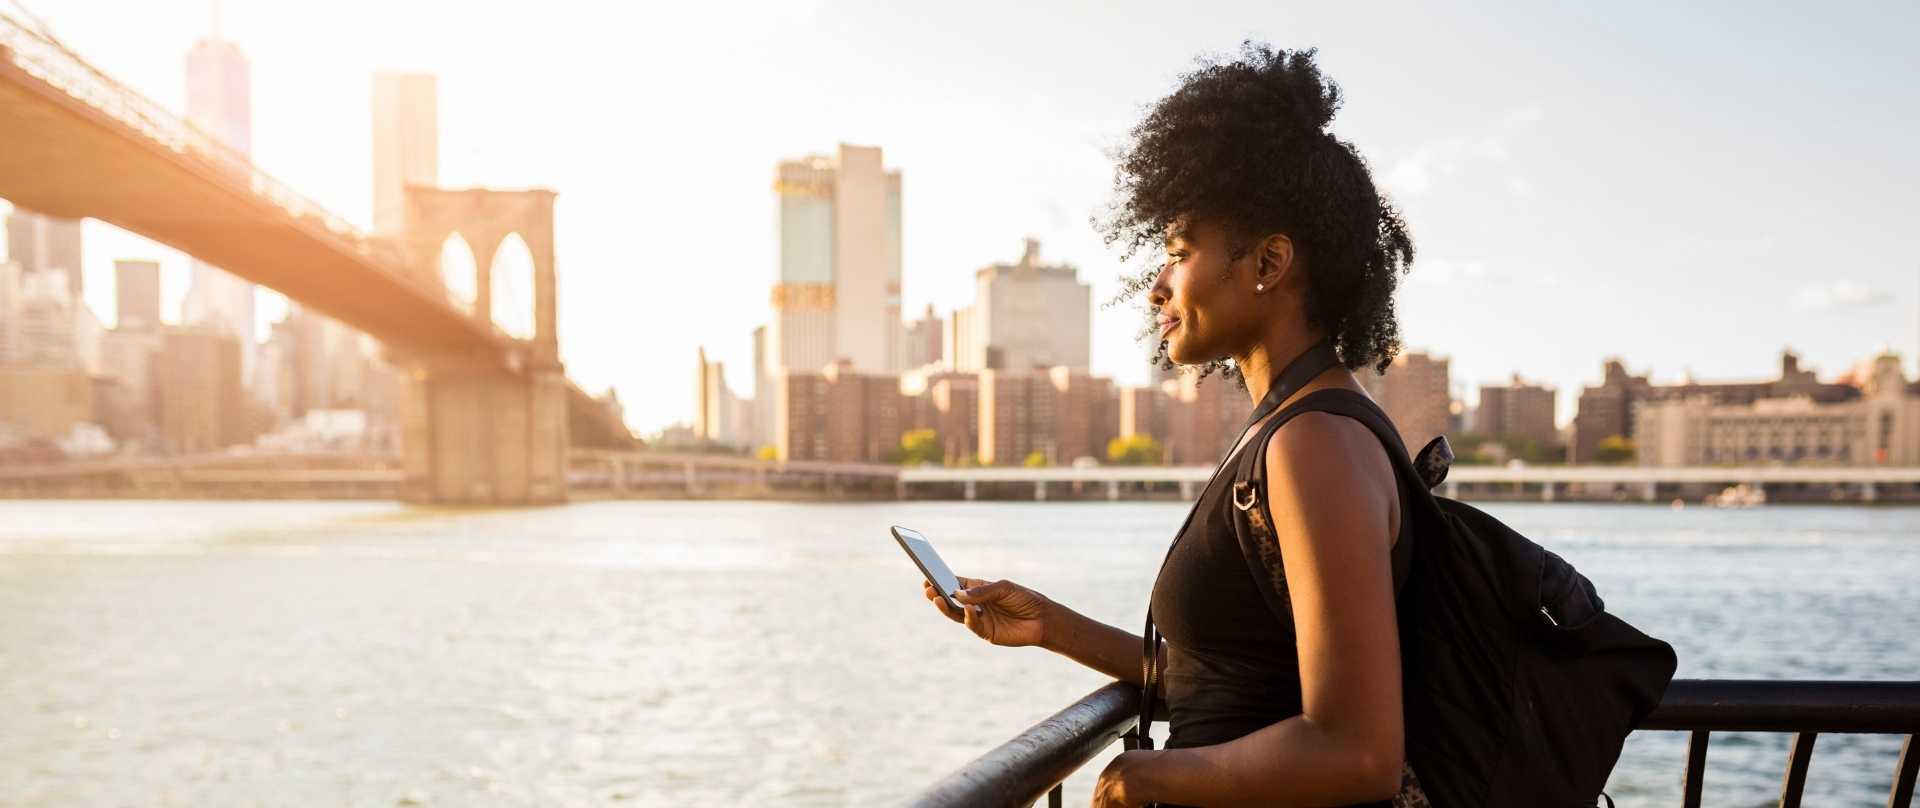 Frau mit Smartphone in New York an Brooklyn Bridge